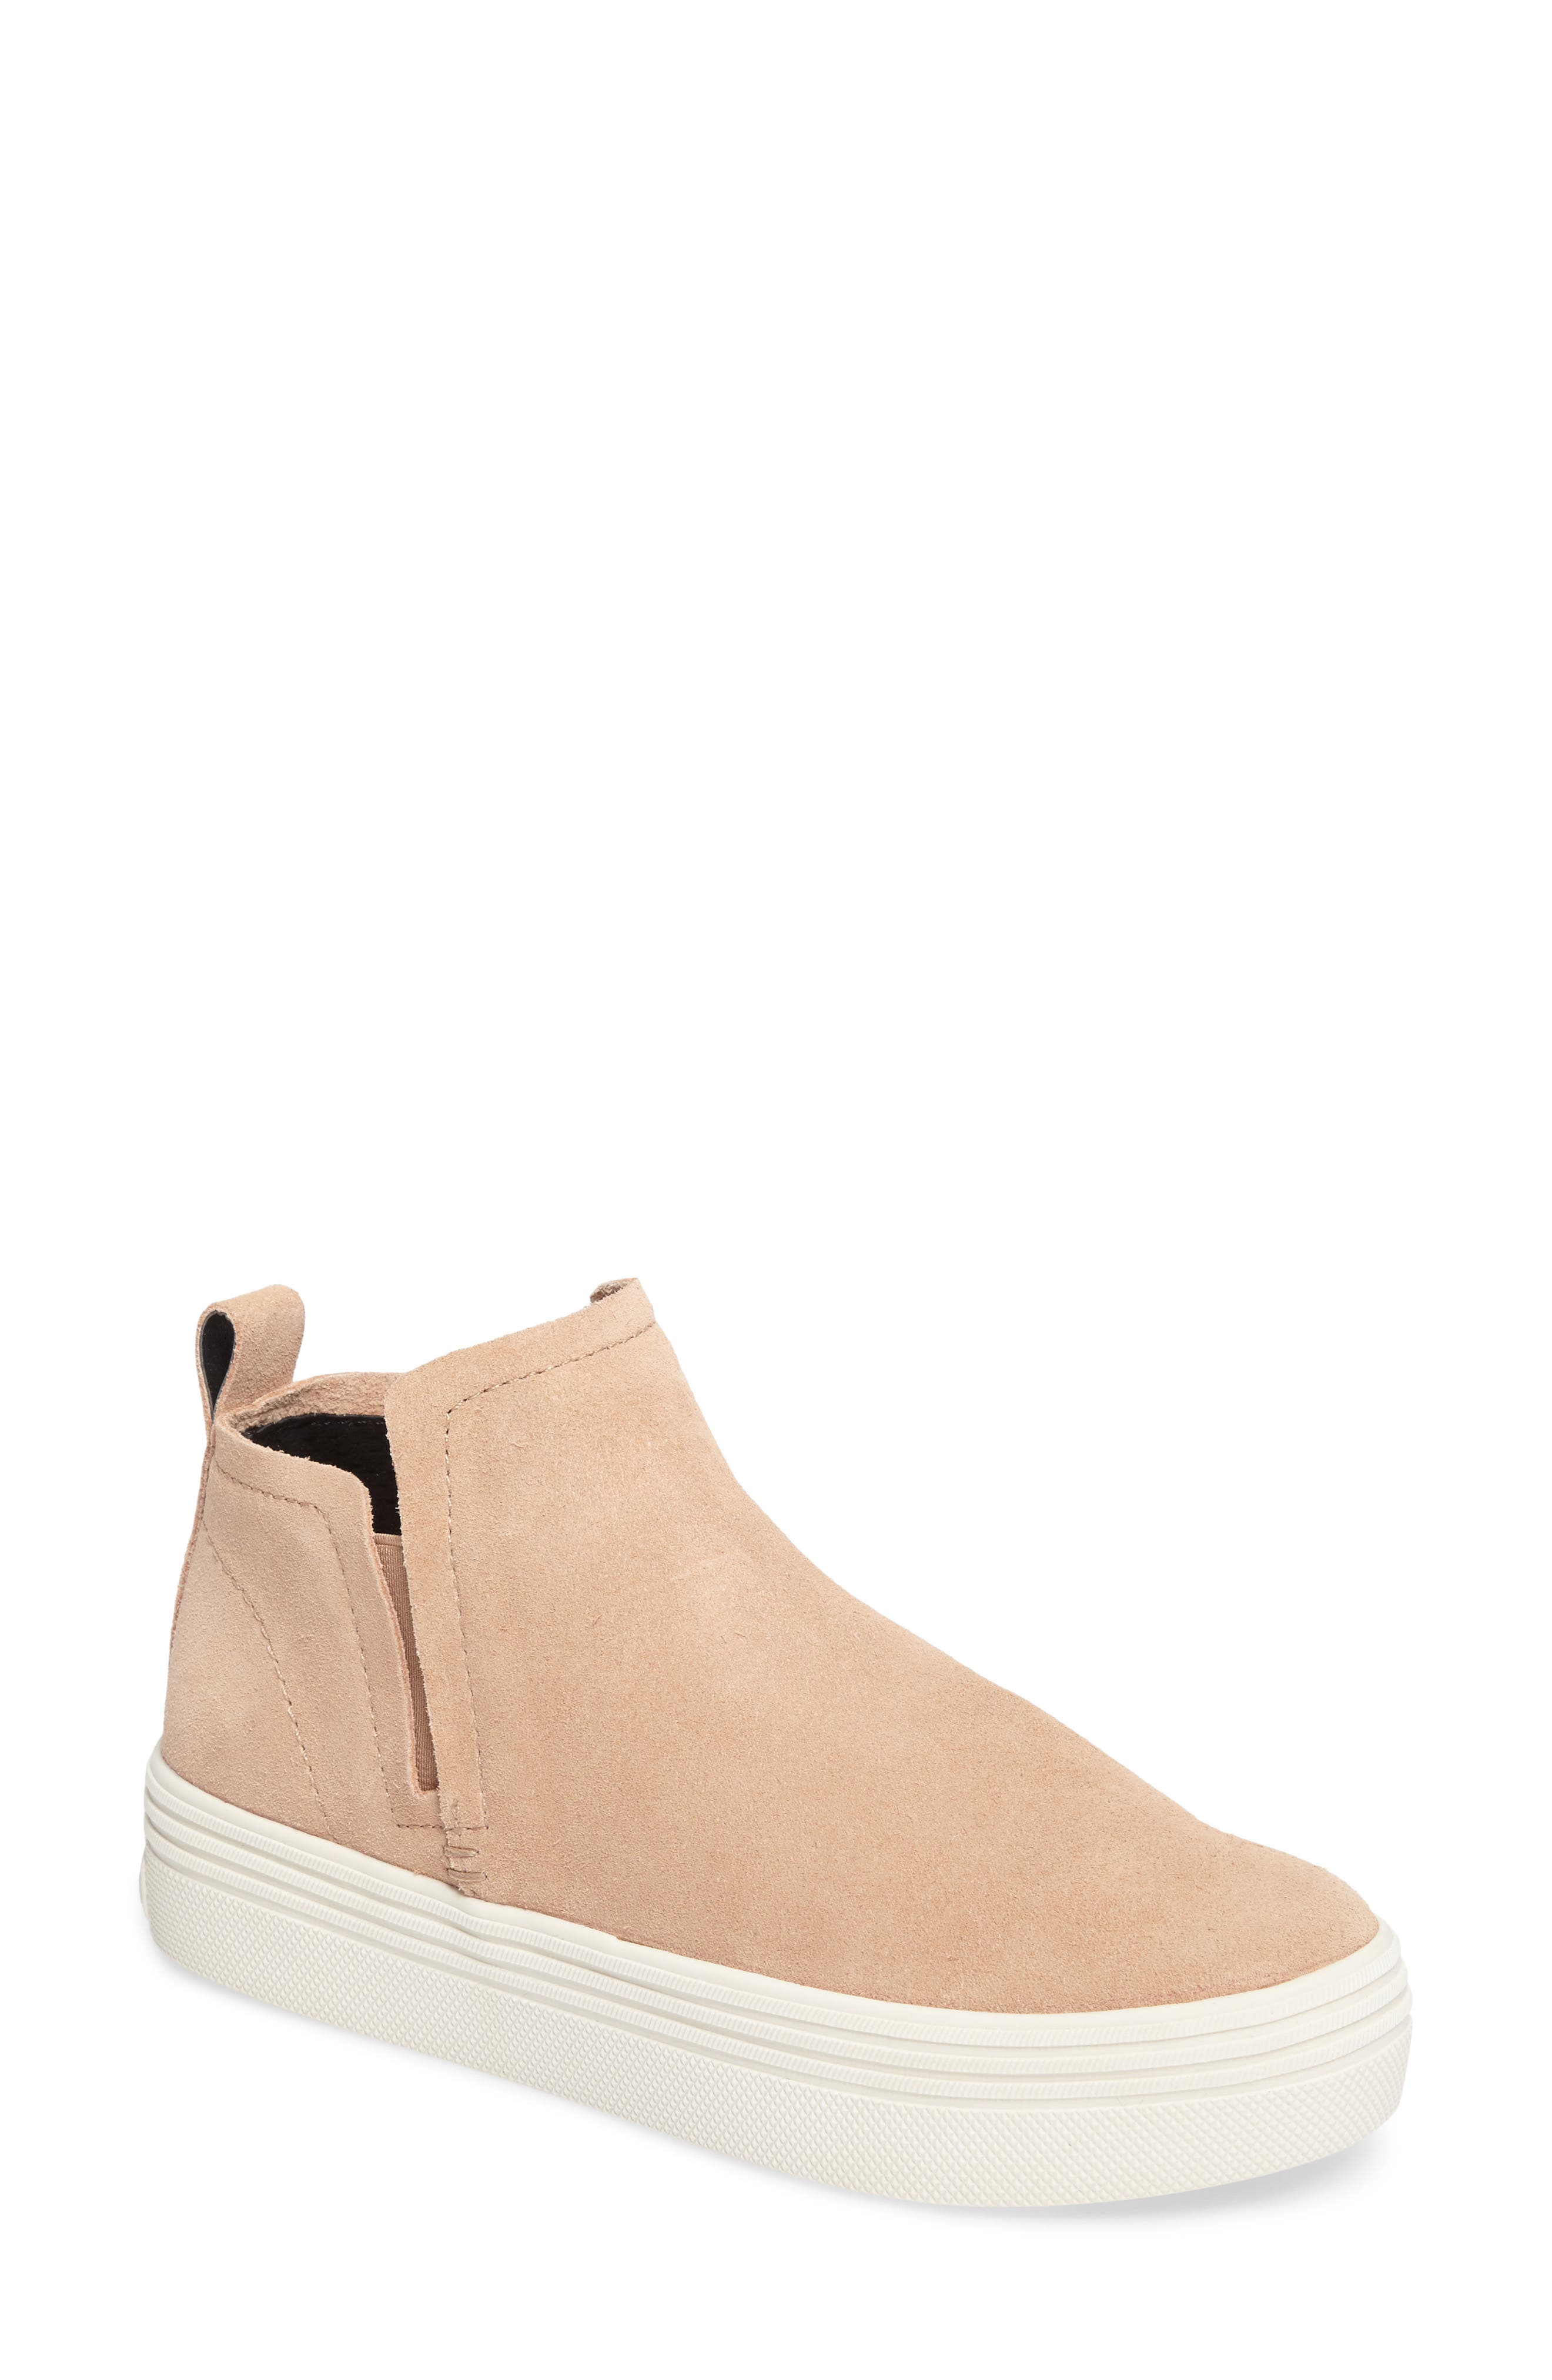 Tate Slip-On Sneaker,                             Main thumbnail 1, color,                             Blush Suede